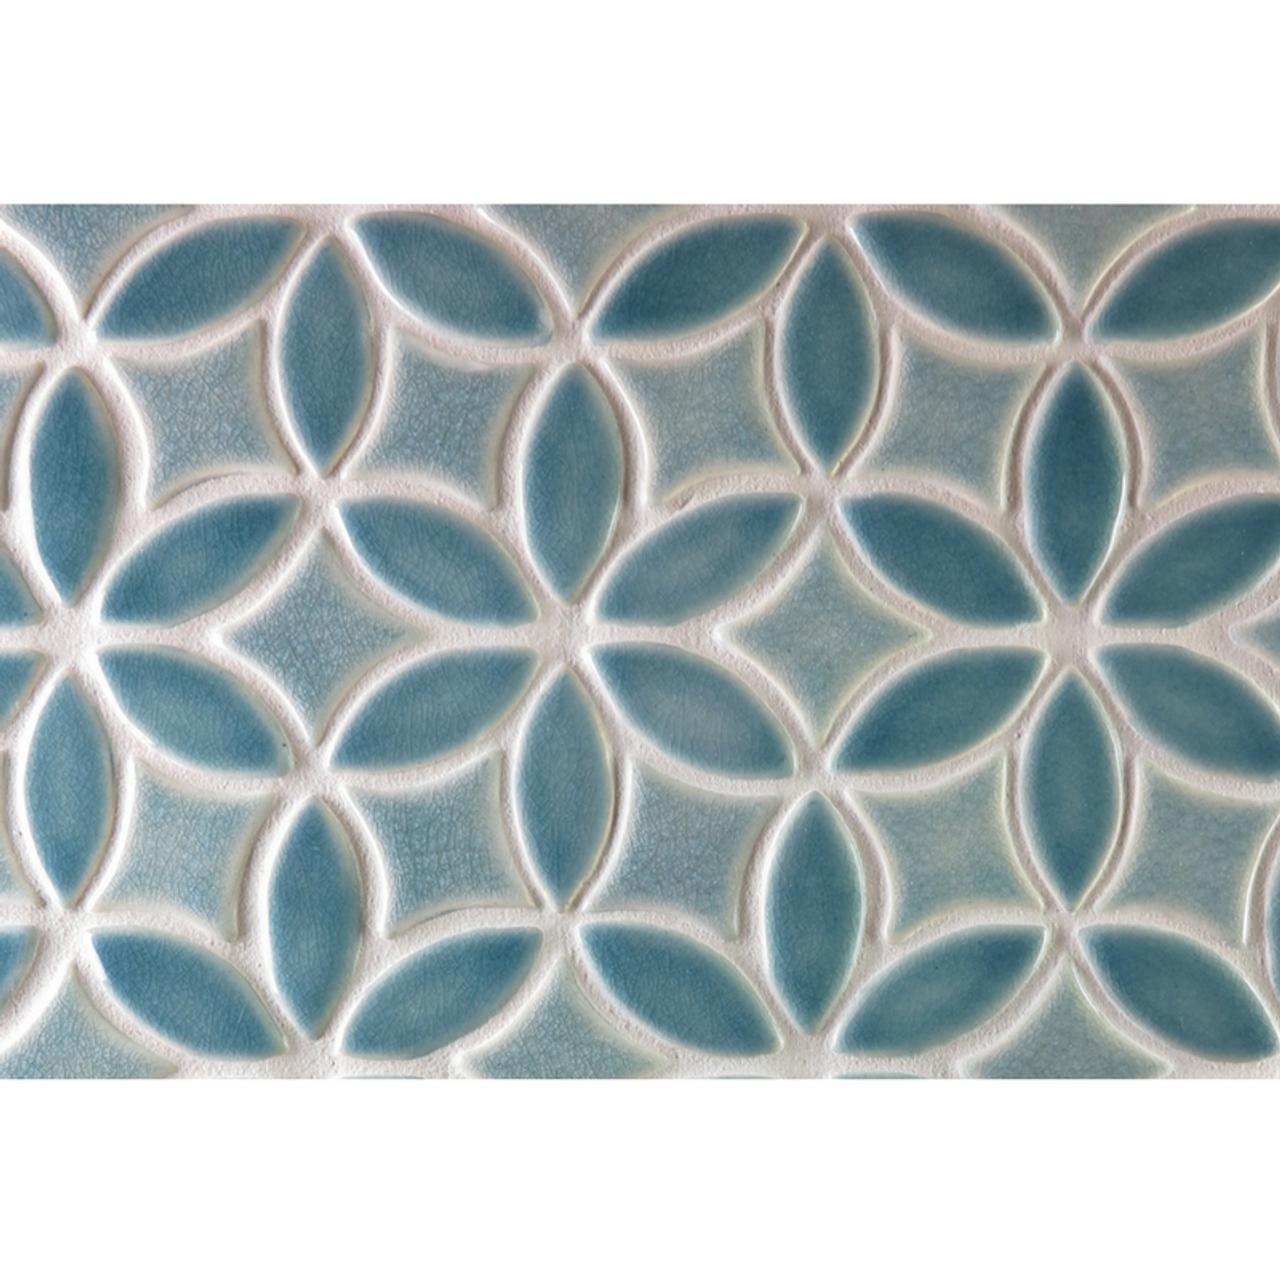 Two-Color Bloom Handmade Tile Border - Julep Tile Company